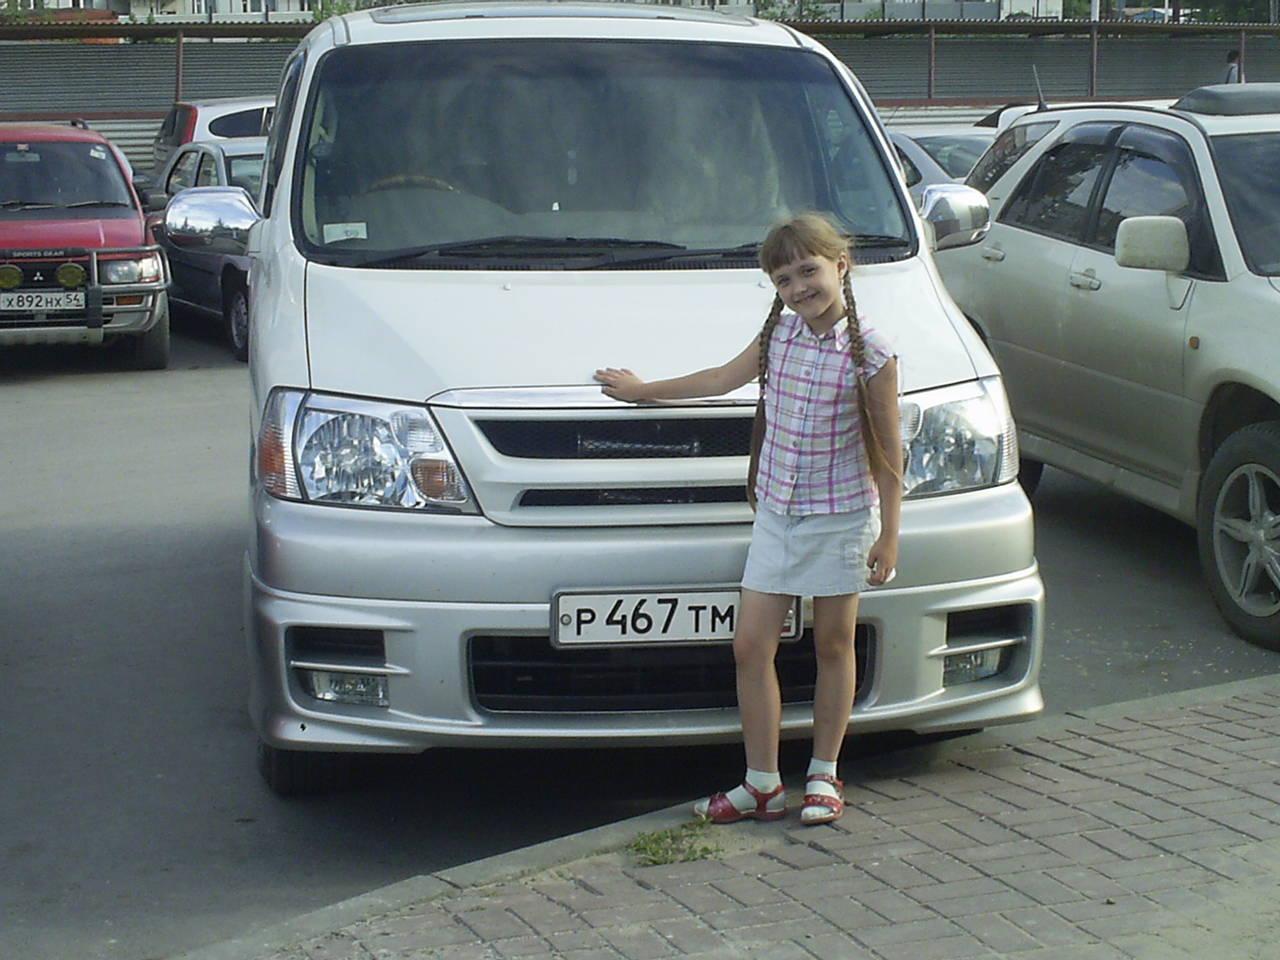 Проложить маршрут из города Екатеринбург в город Анапа